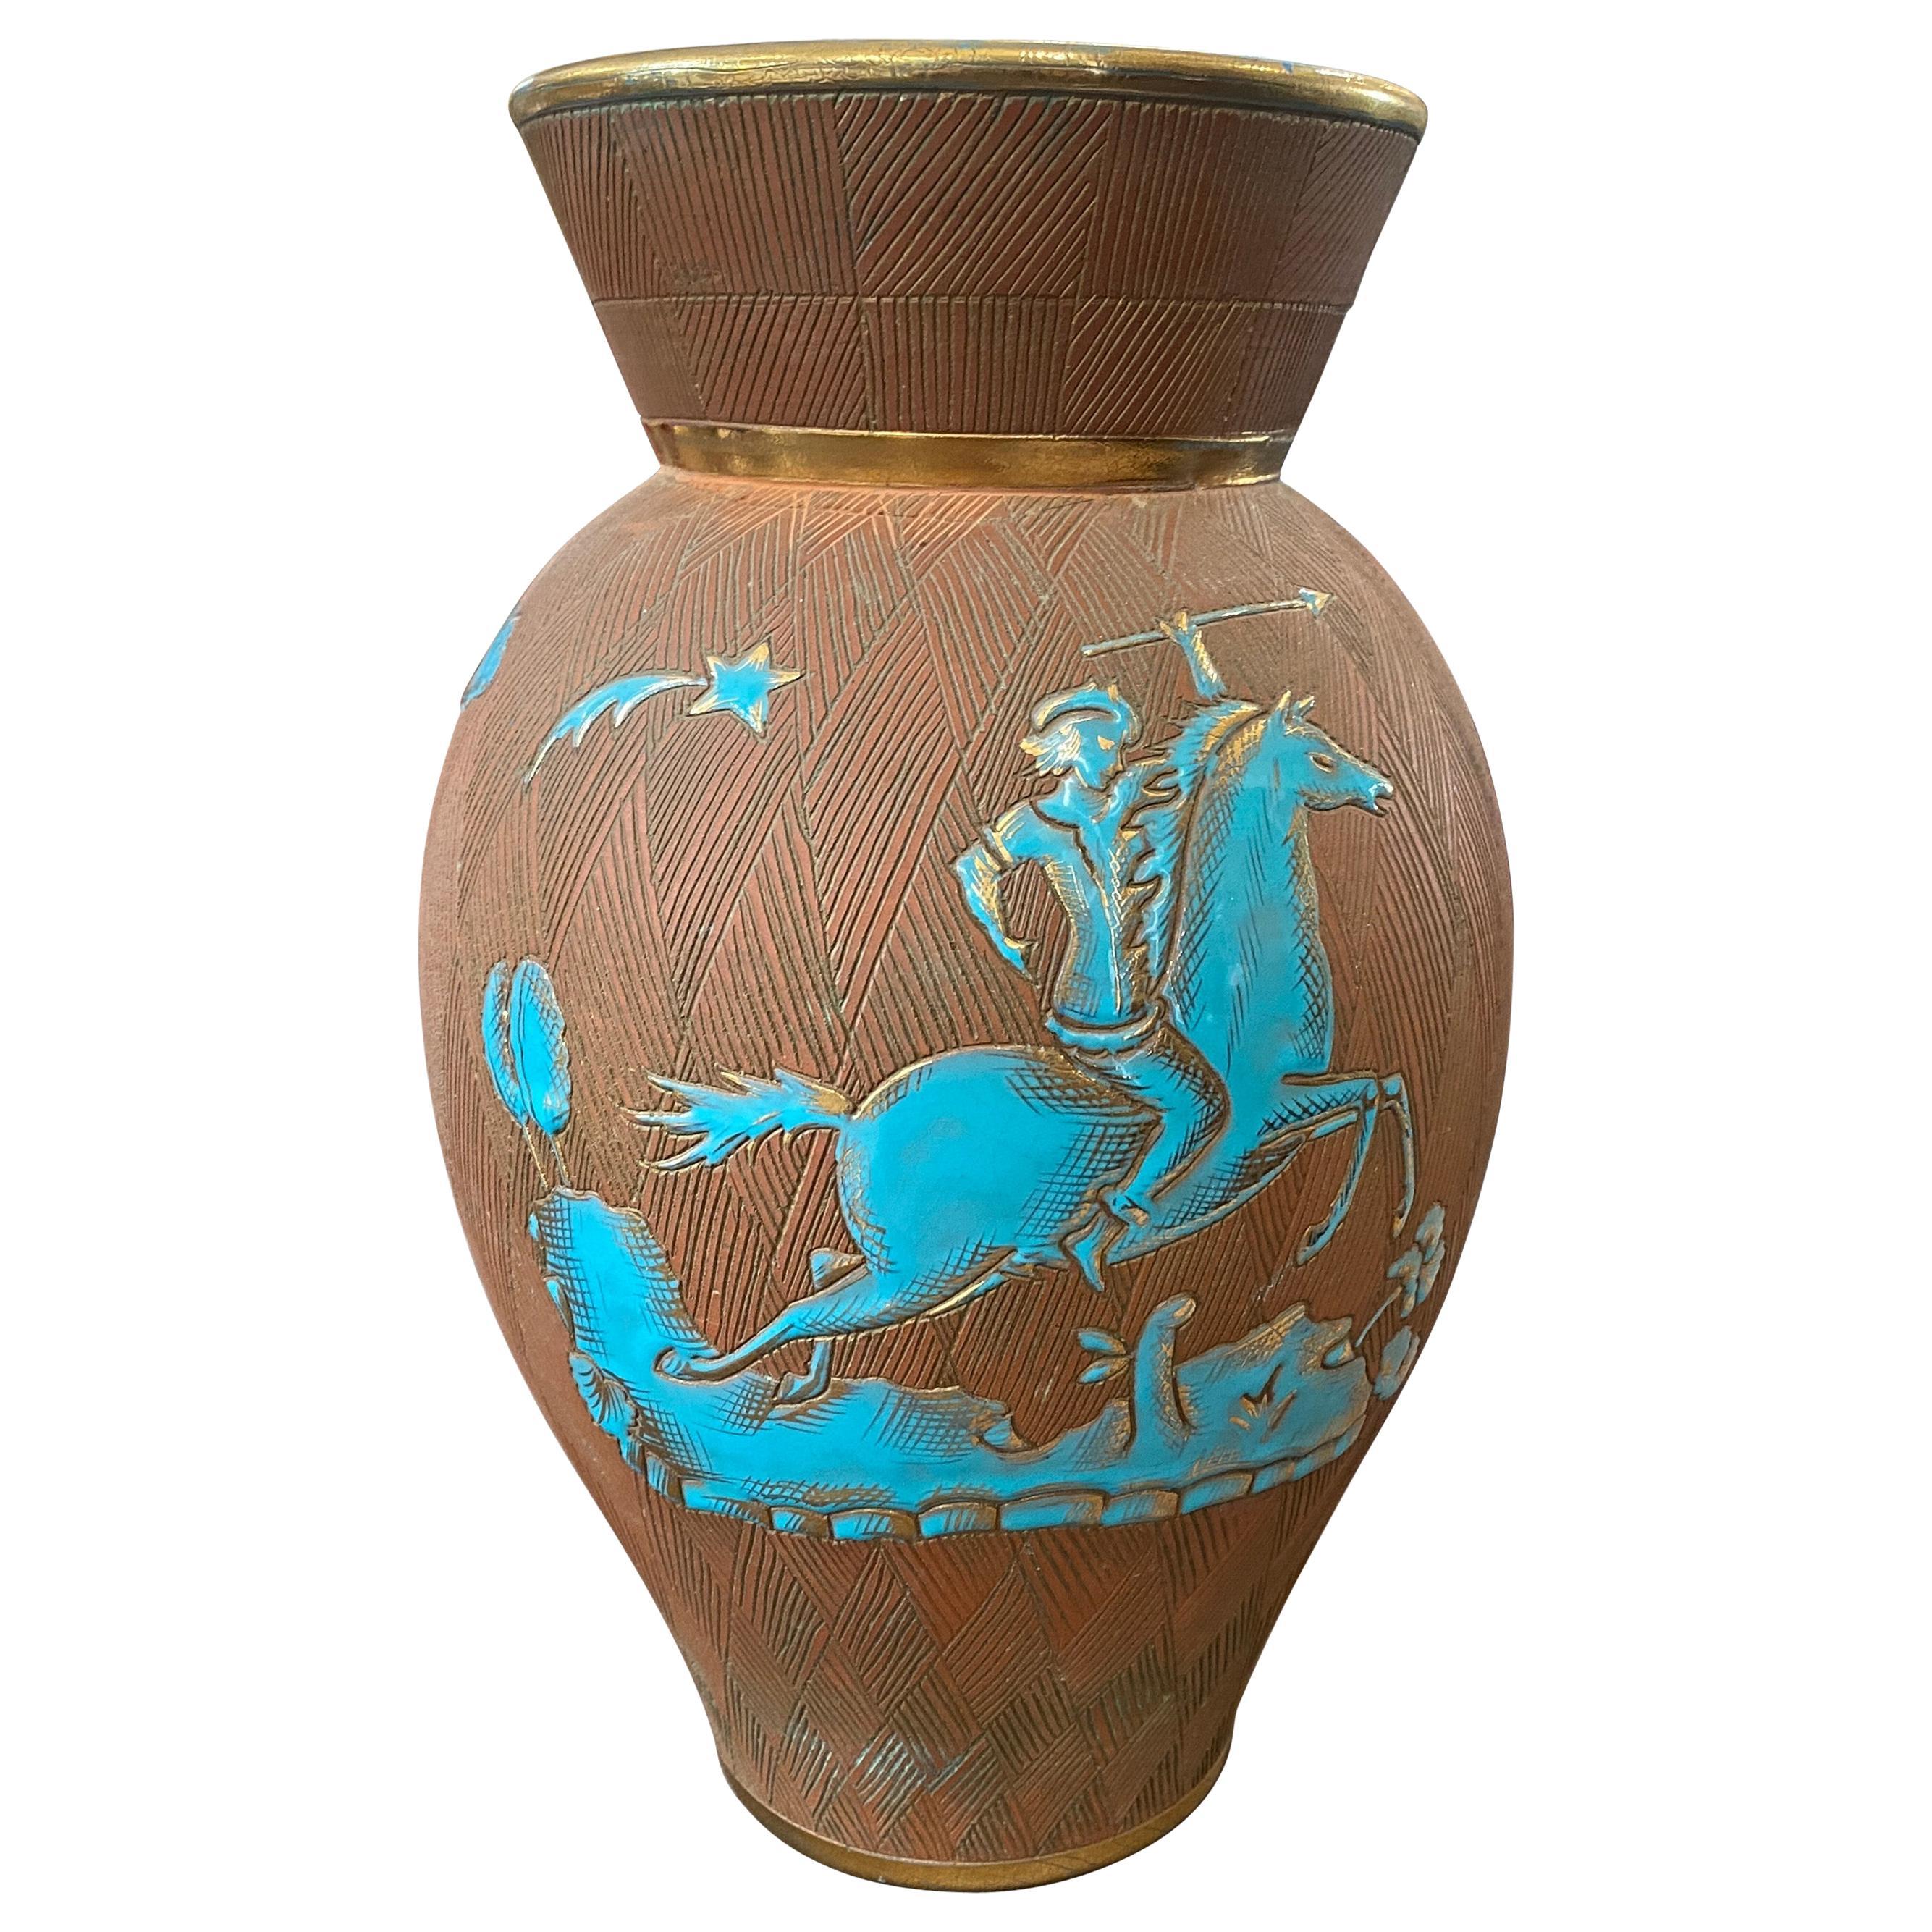 1950s Mid-Century Modern Ceramic Italian Vase by Fantechi